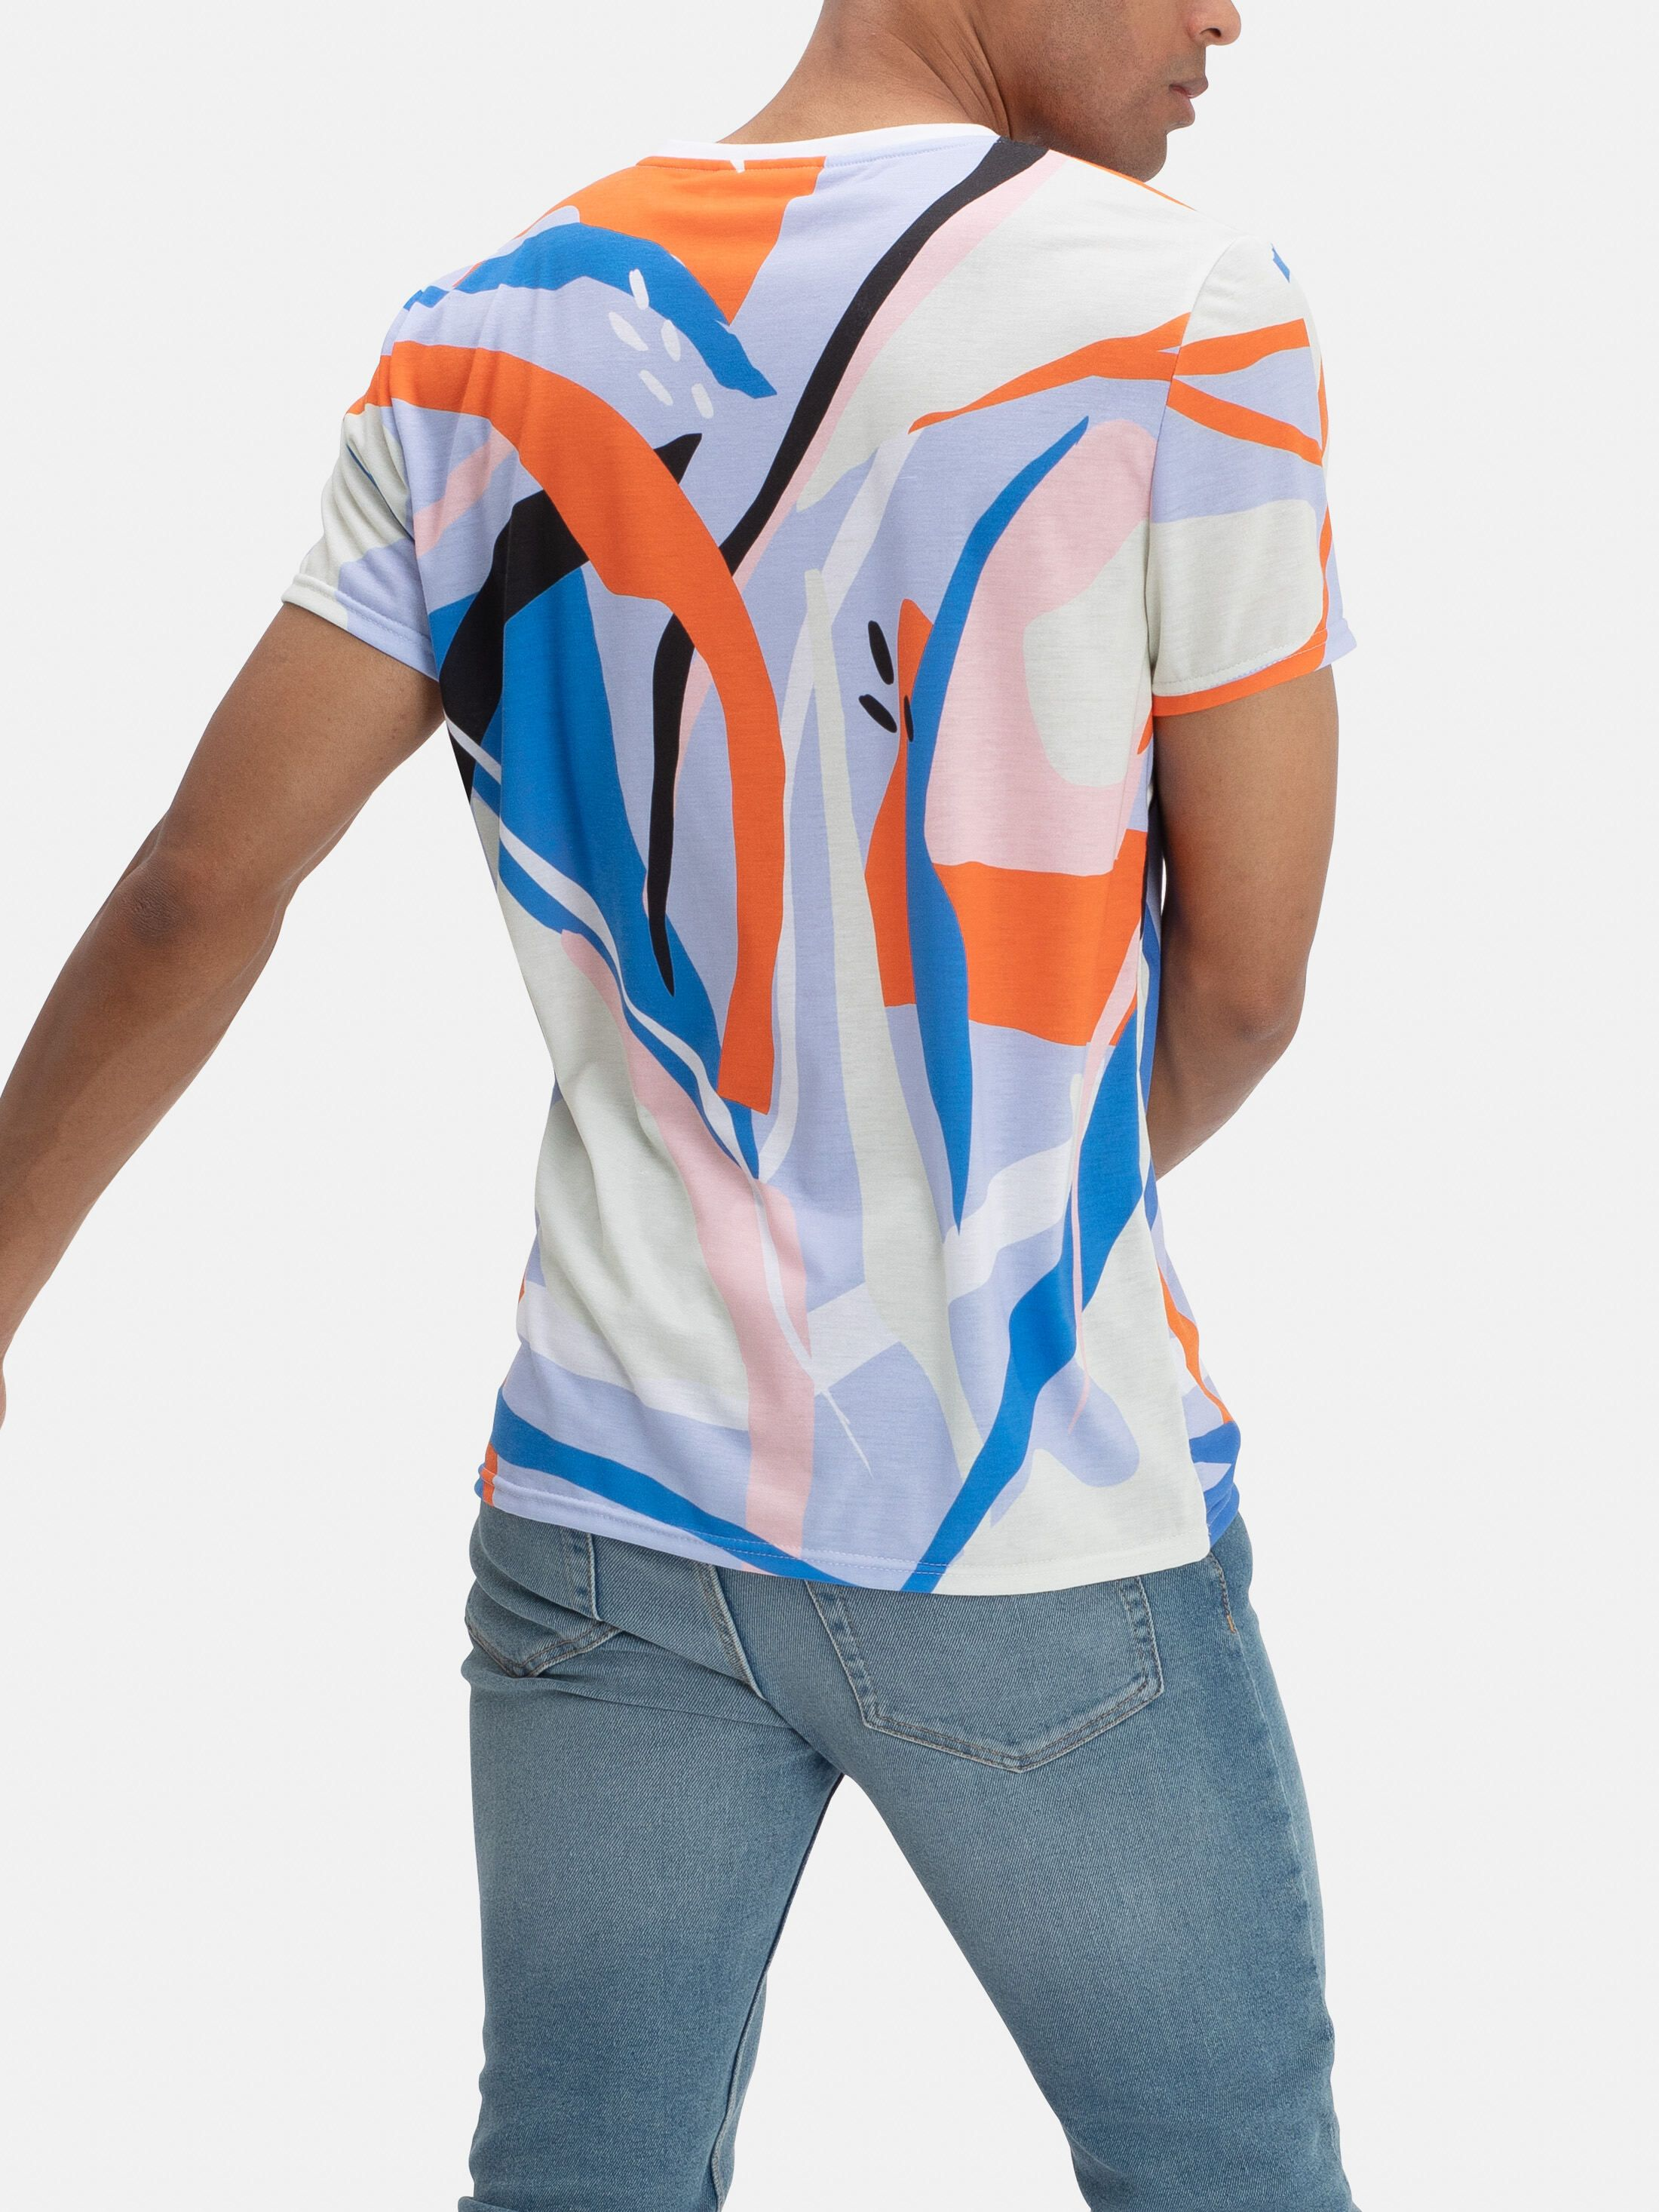 impresion continua camiseta personalizada online